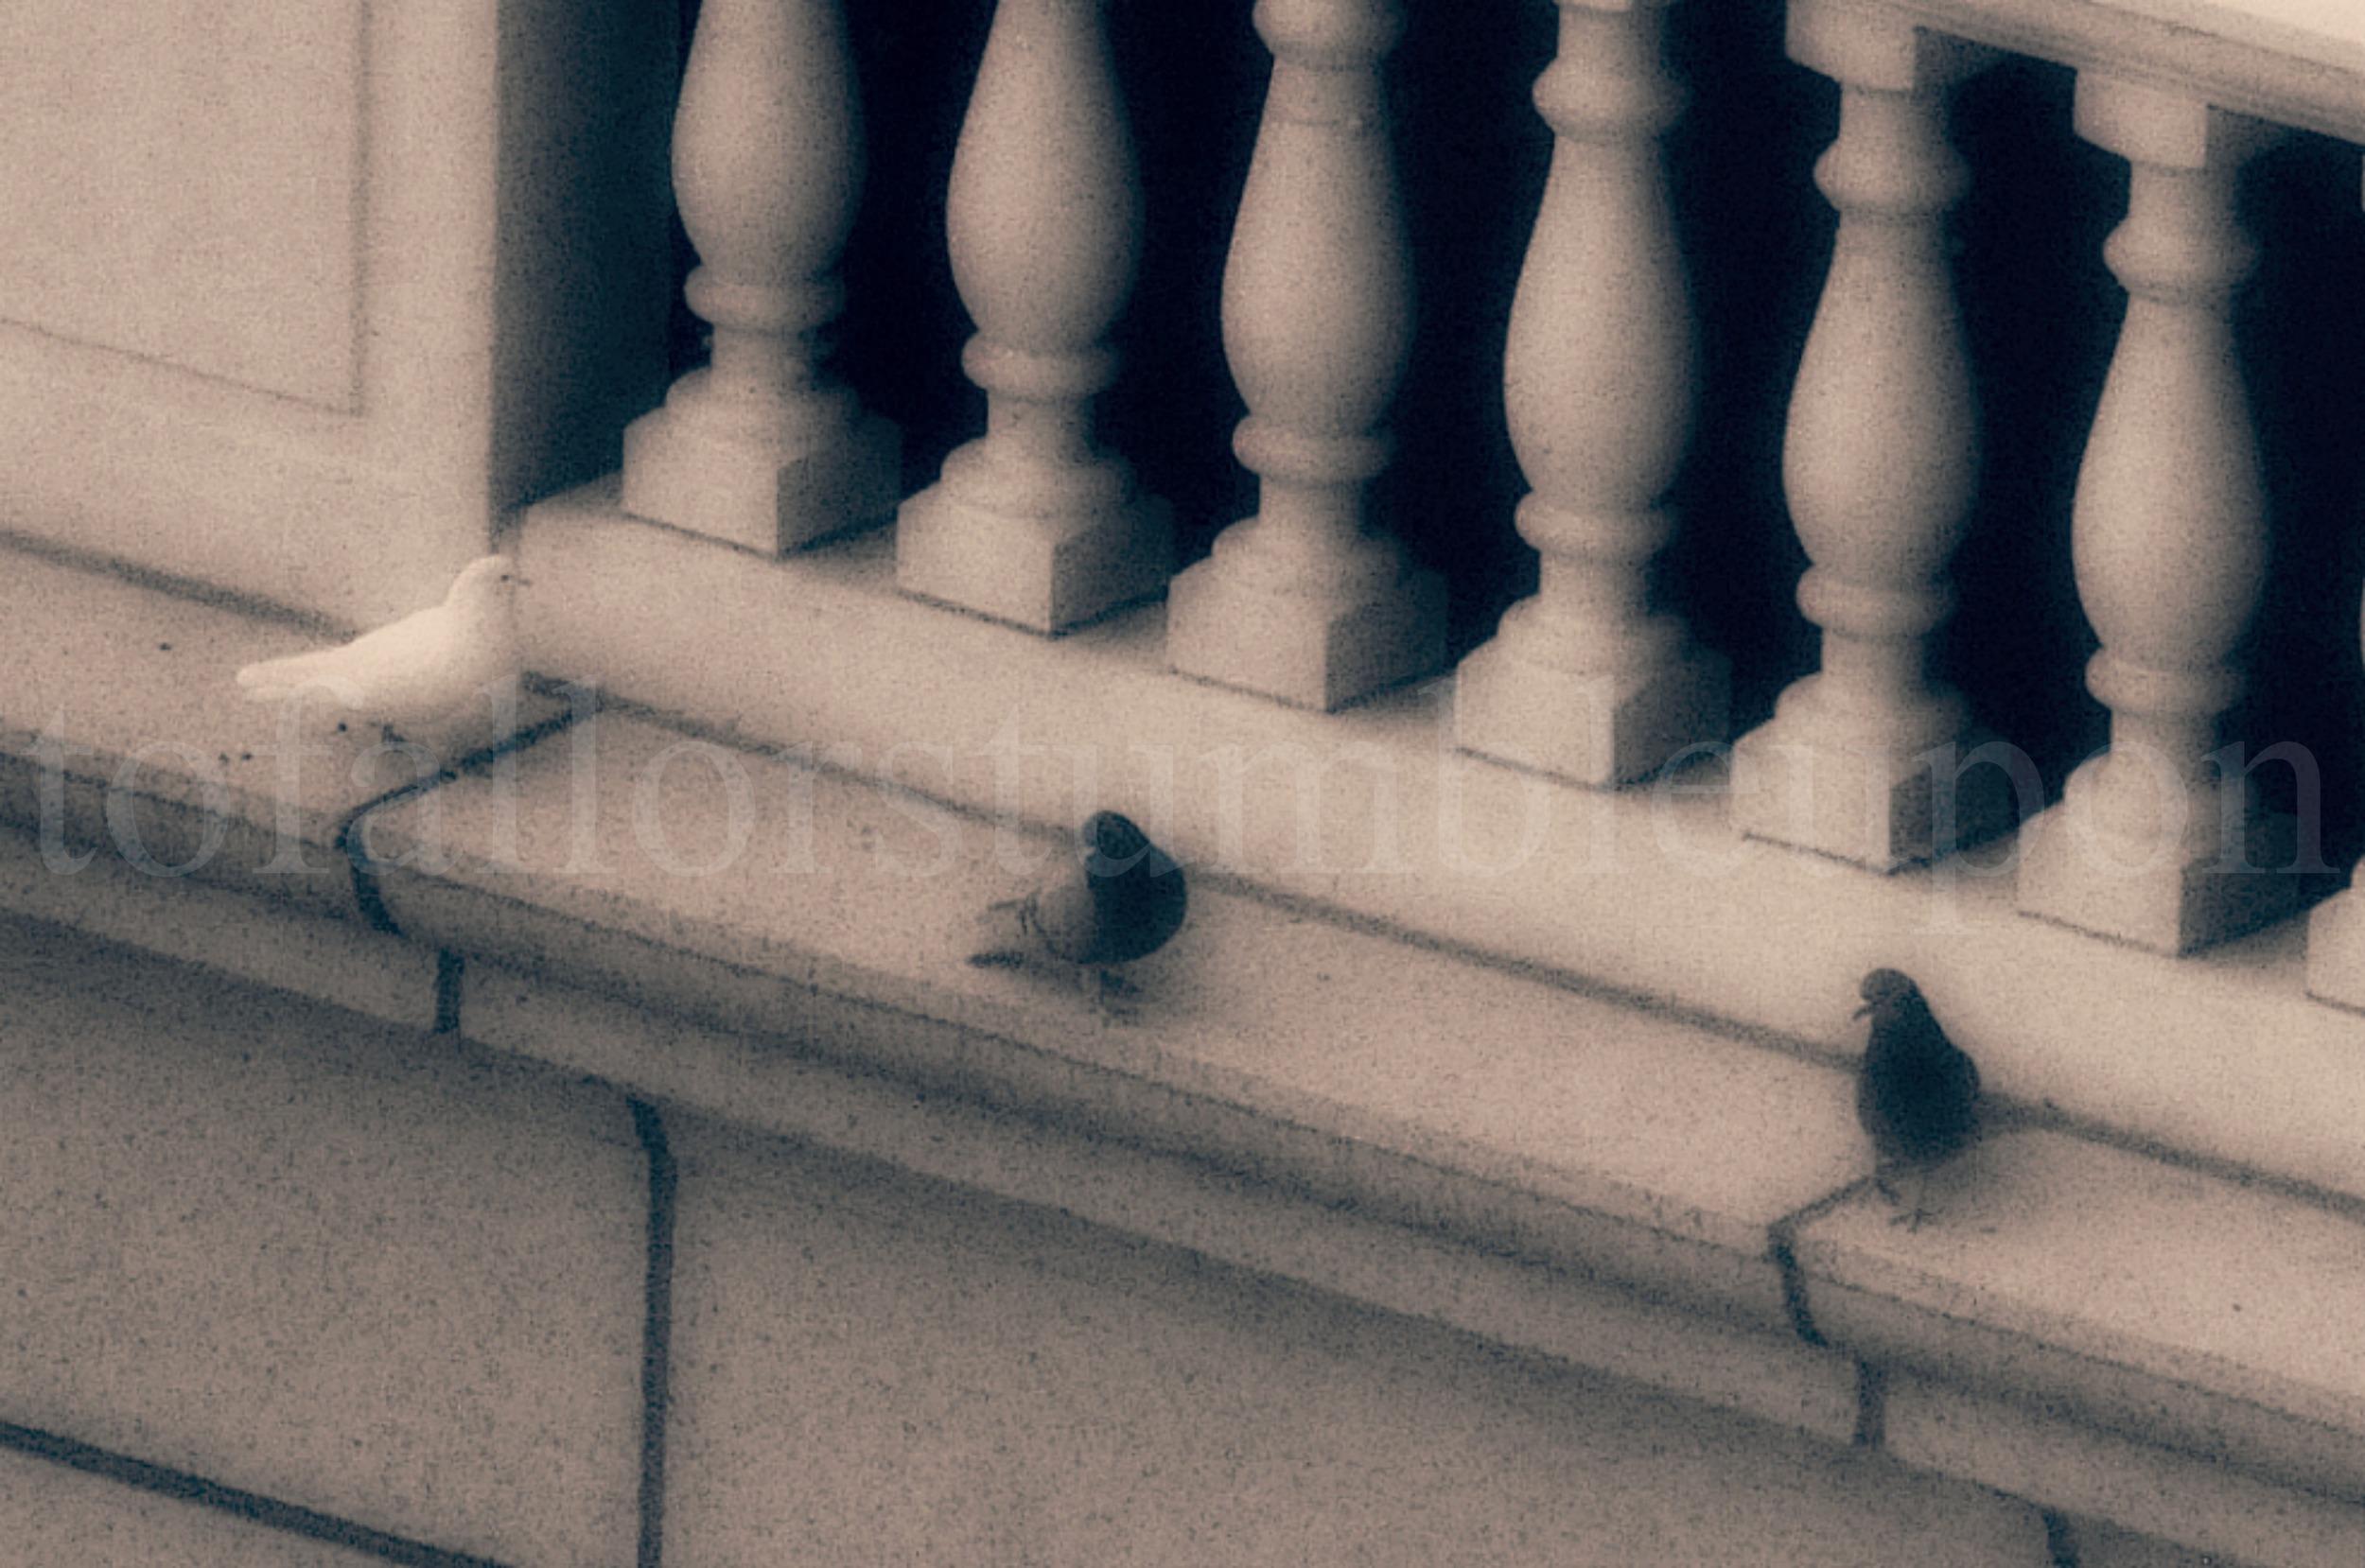 _DSC6844 edit 2.jpg